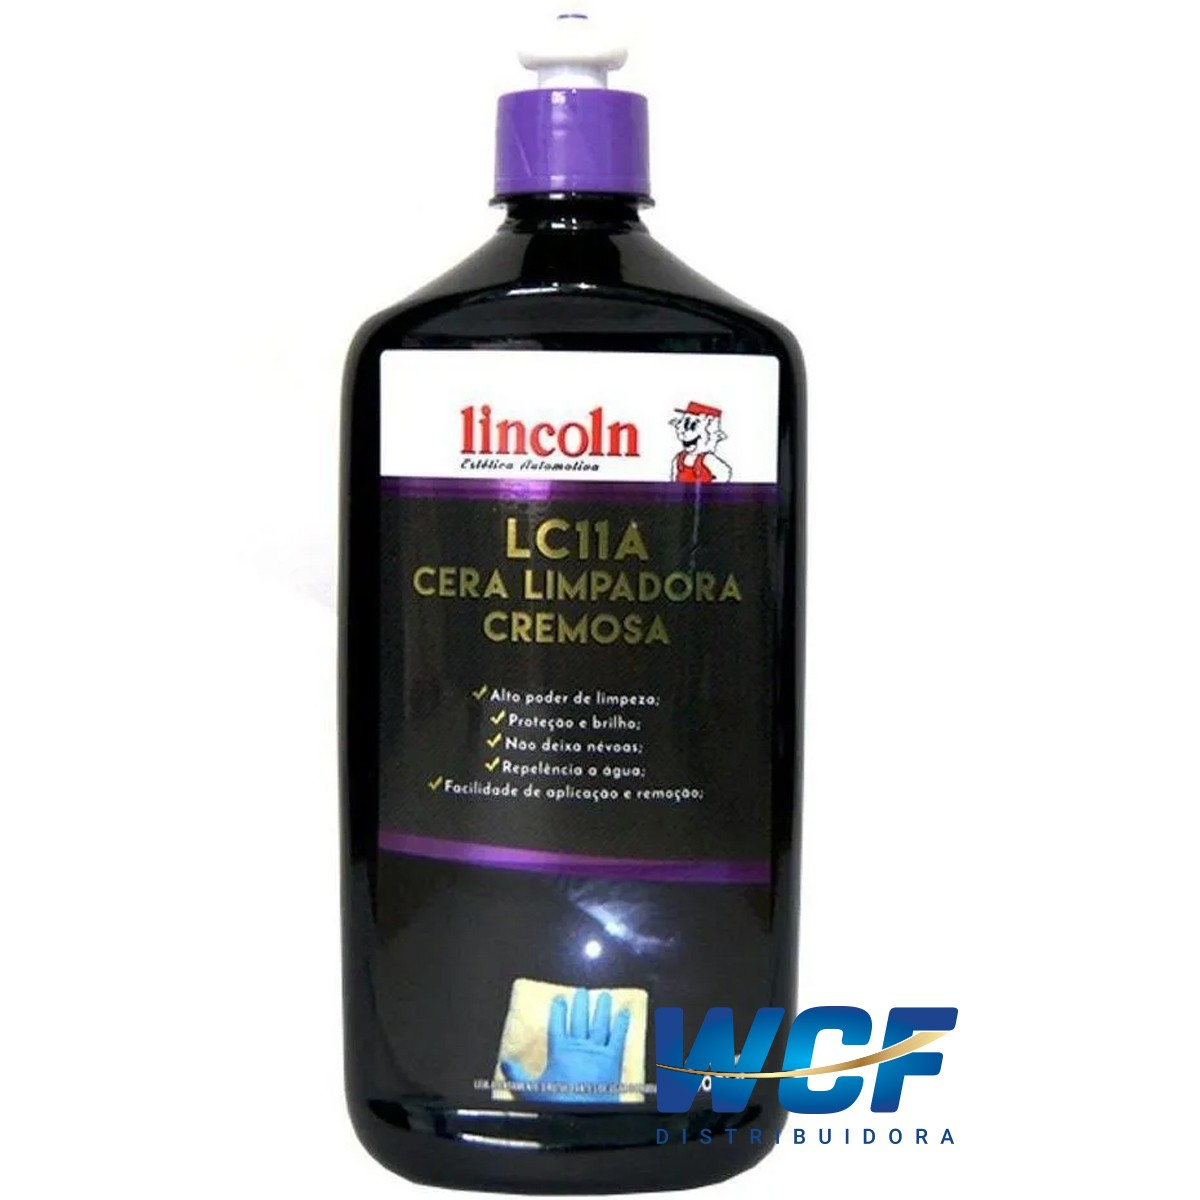 LINCOLN CERA LIMPADORA CREMOSA LIQUIDA  500 ML